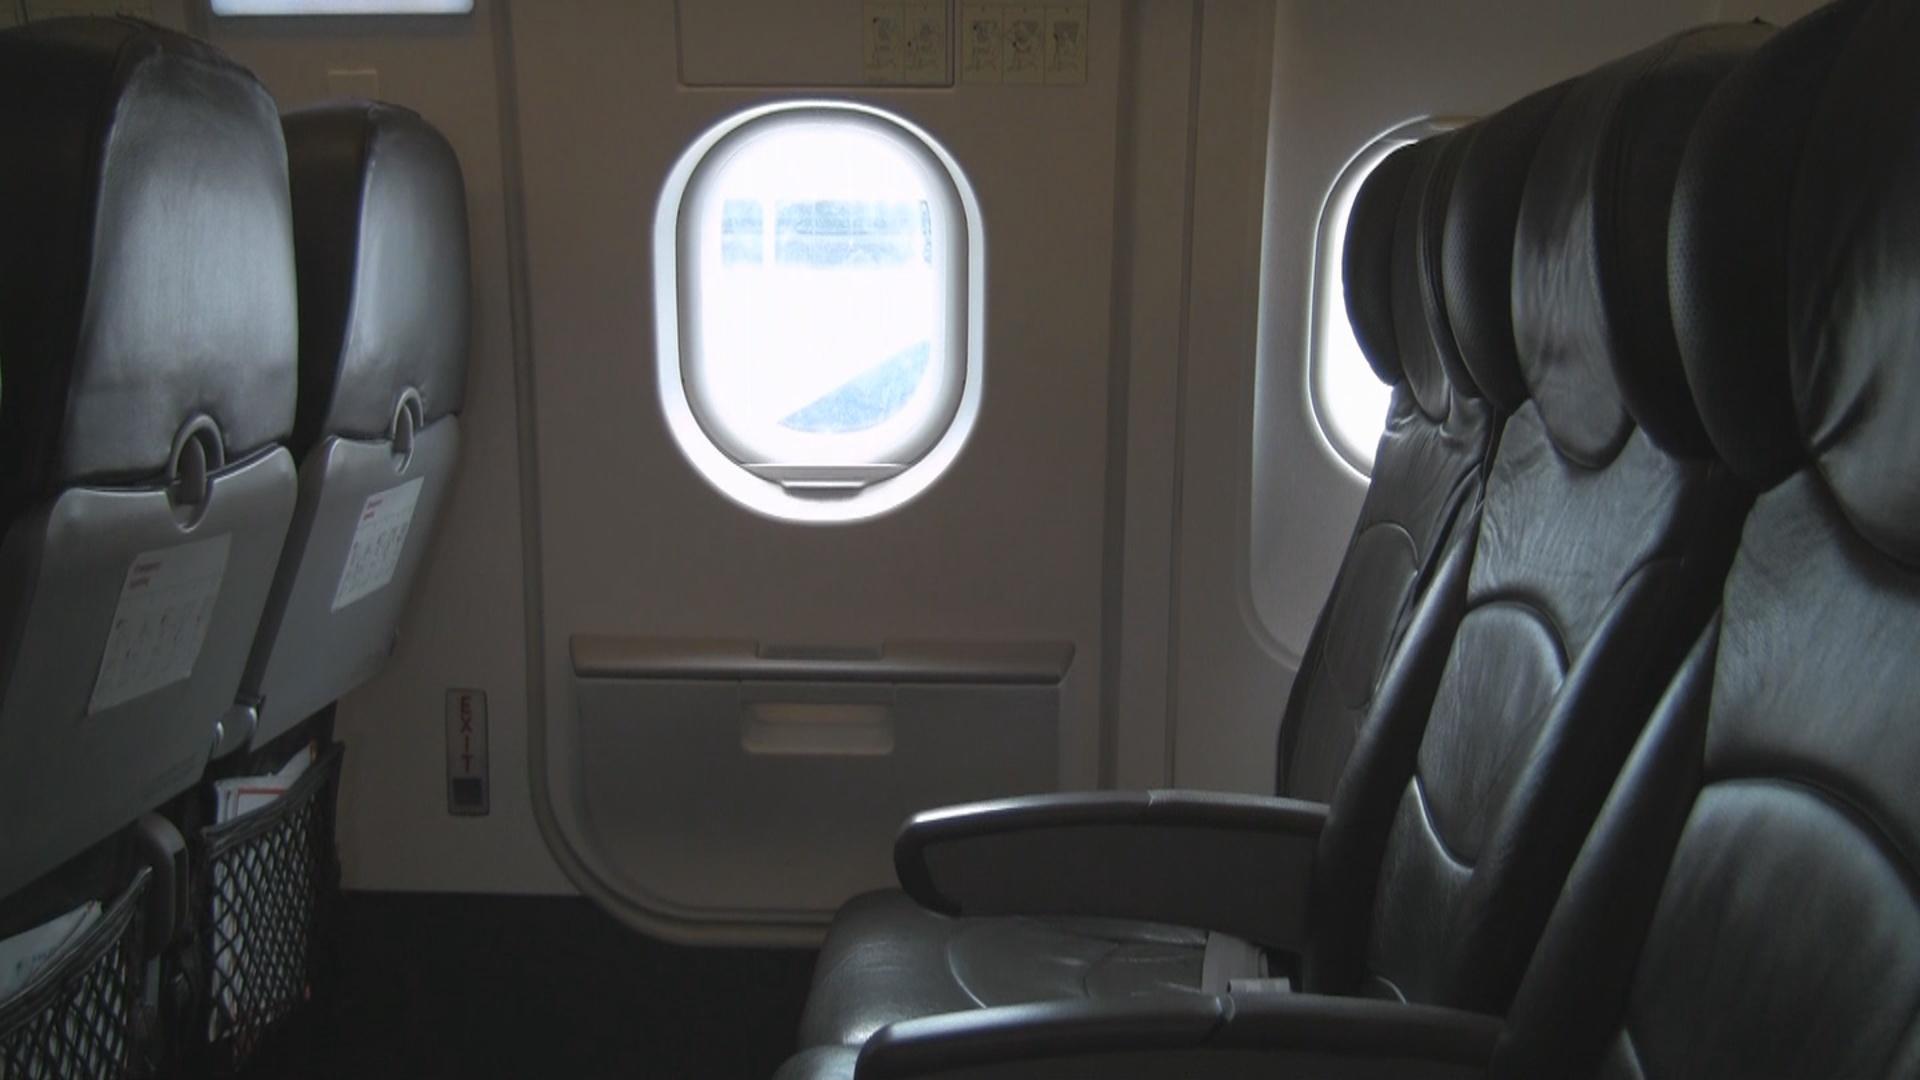 Jetstar Asia Jetstar Japan Airline Profiles Modhop Com